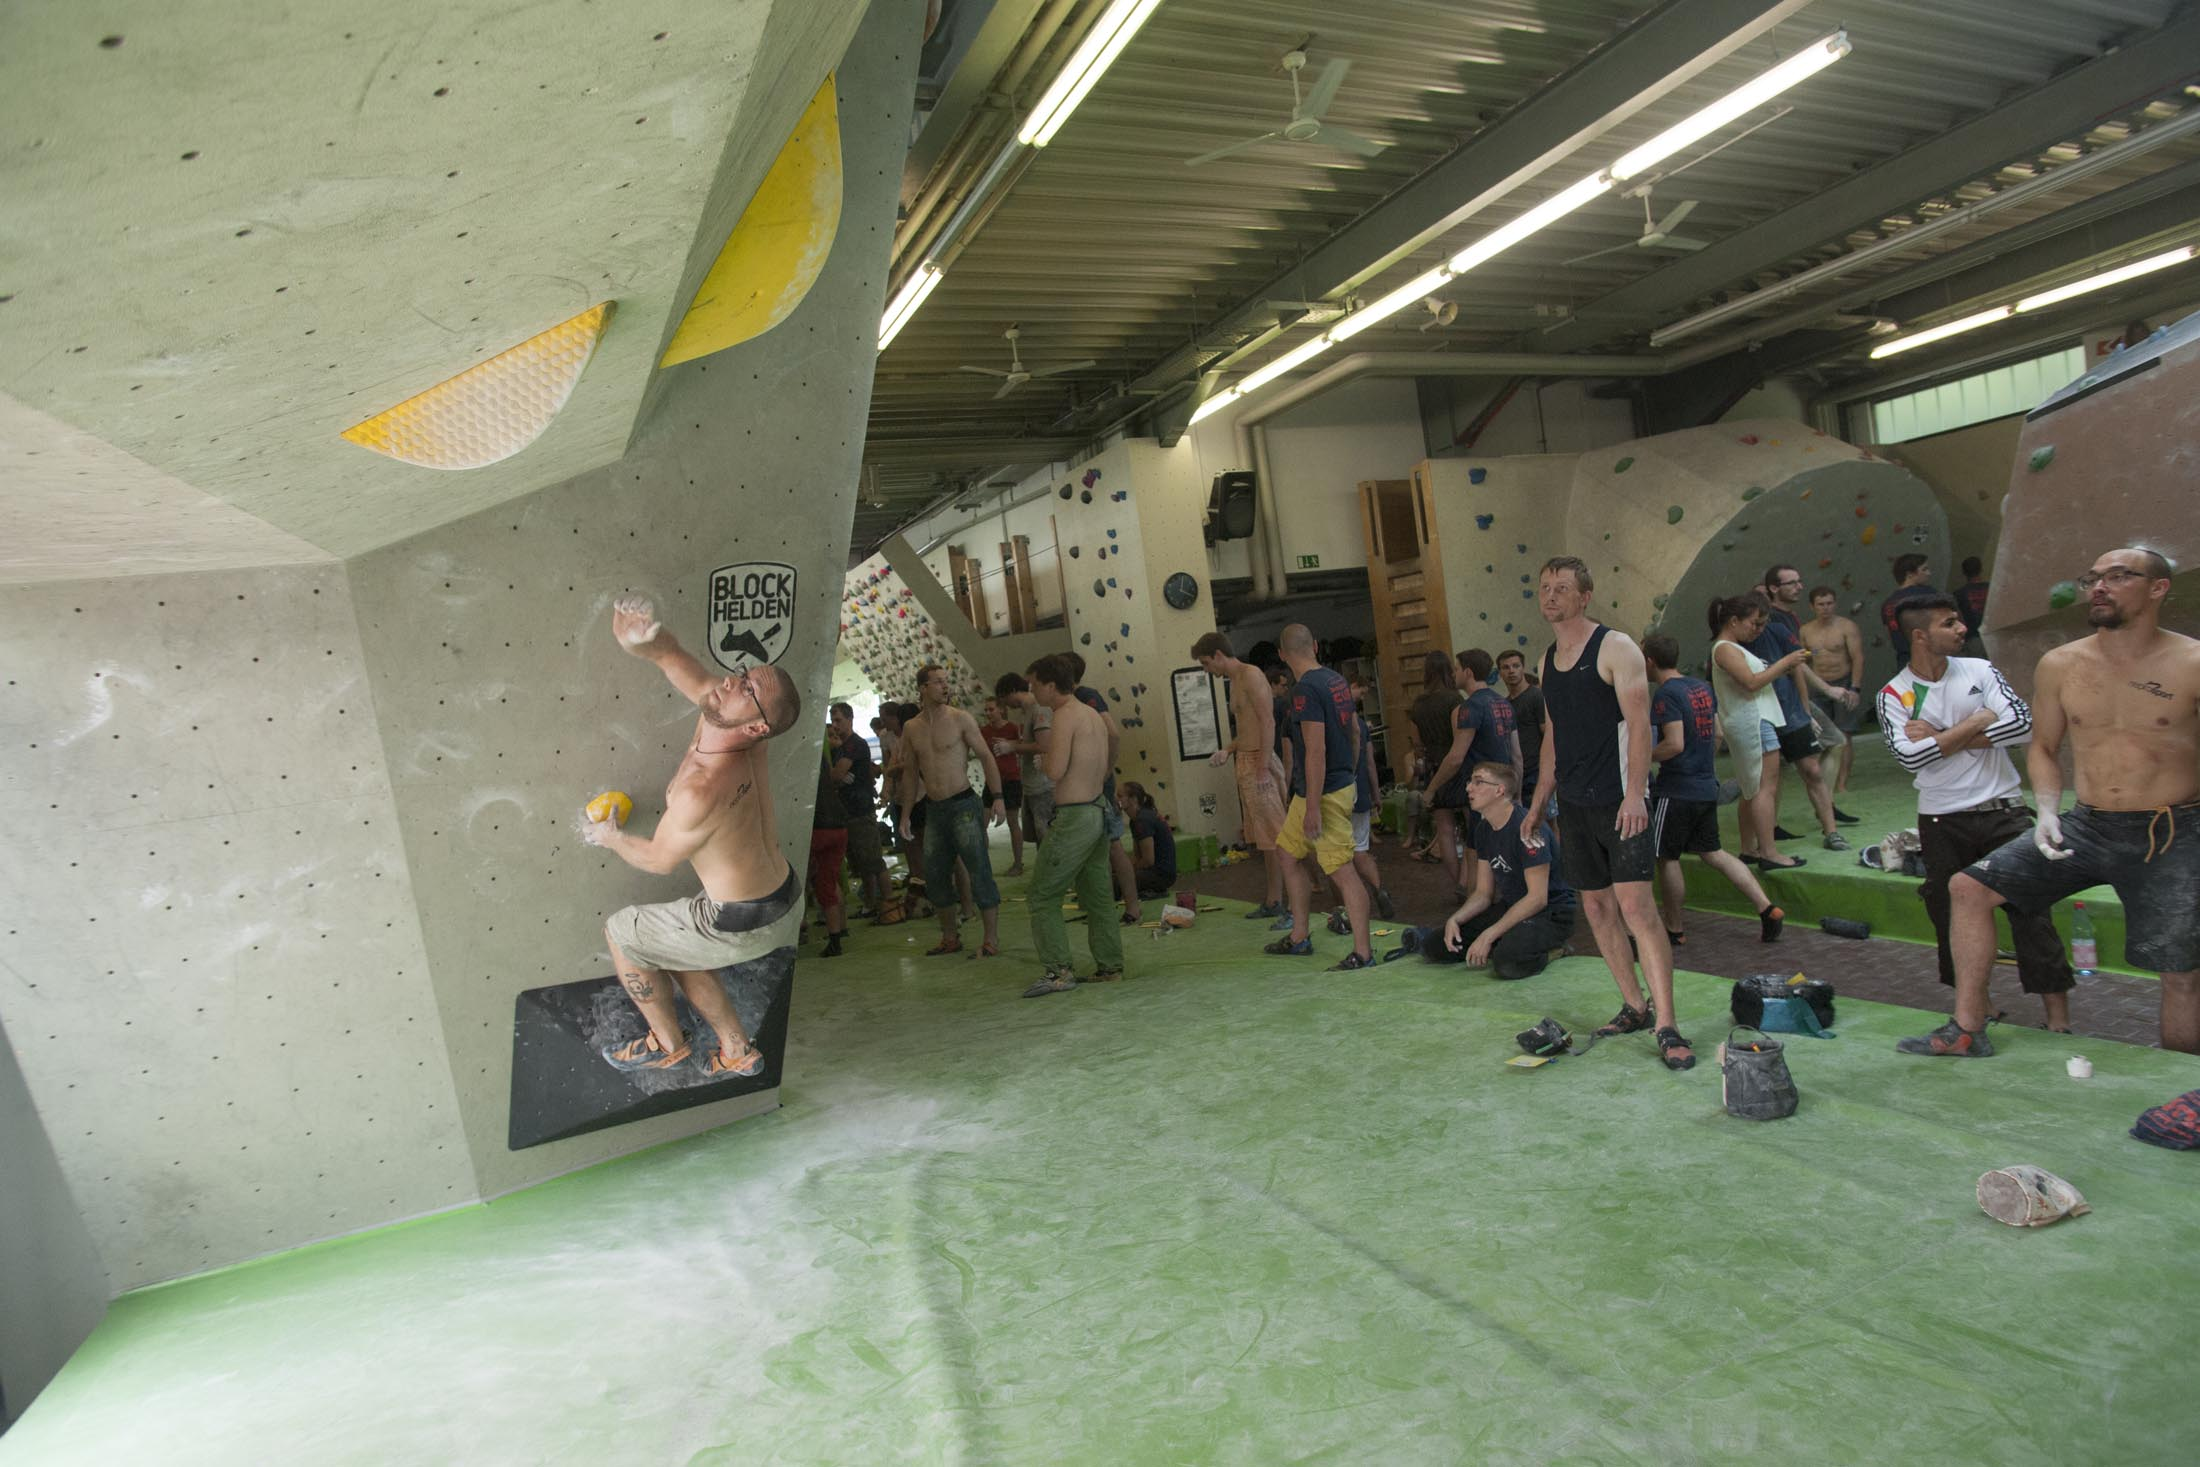 Quali, internationaler bouldercup Frankenjura 2016, BLOCKHELDEN Erlangen, Mammut, Bergfreunde.de, Boulderwettkampf07092016409